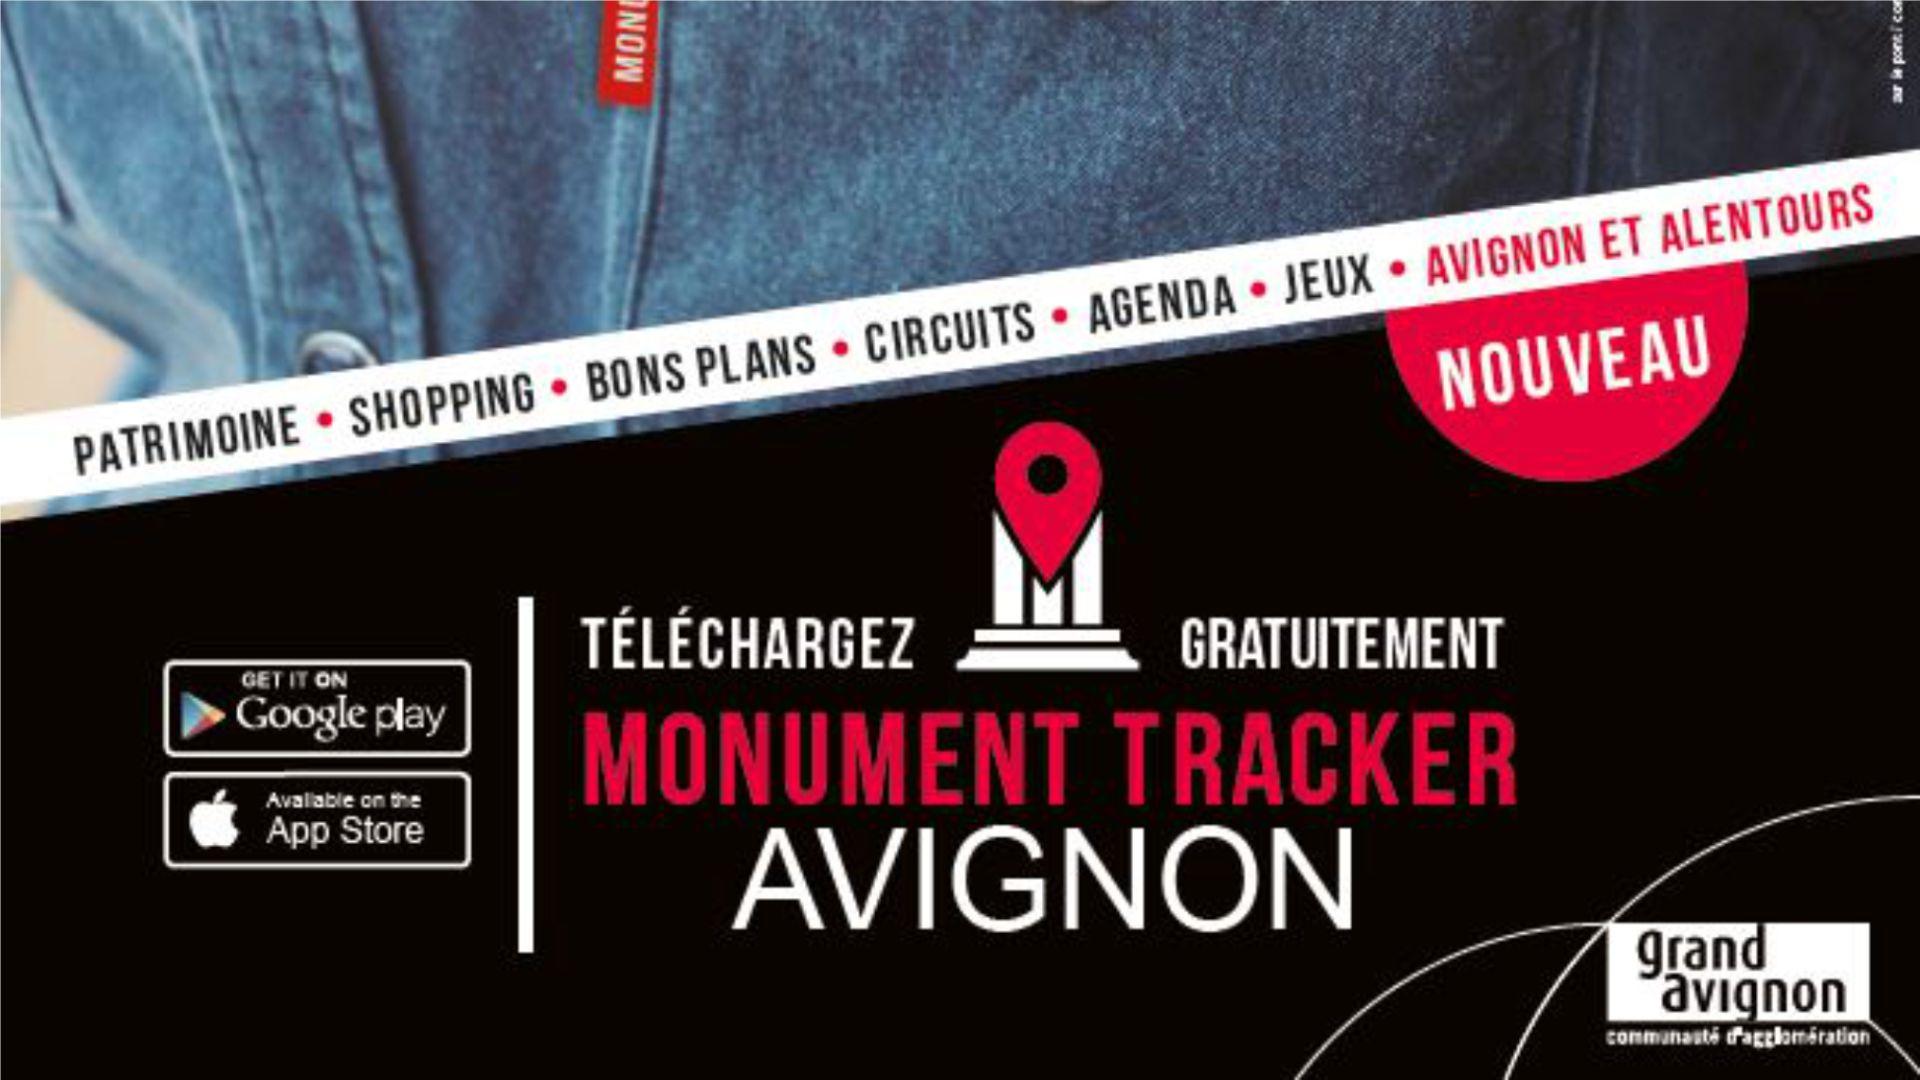 Monument Tracker Grand Avignon